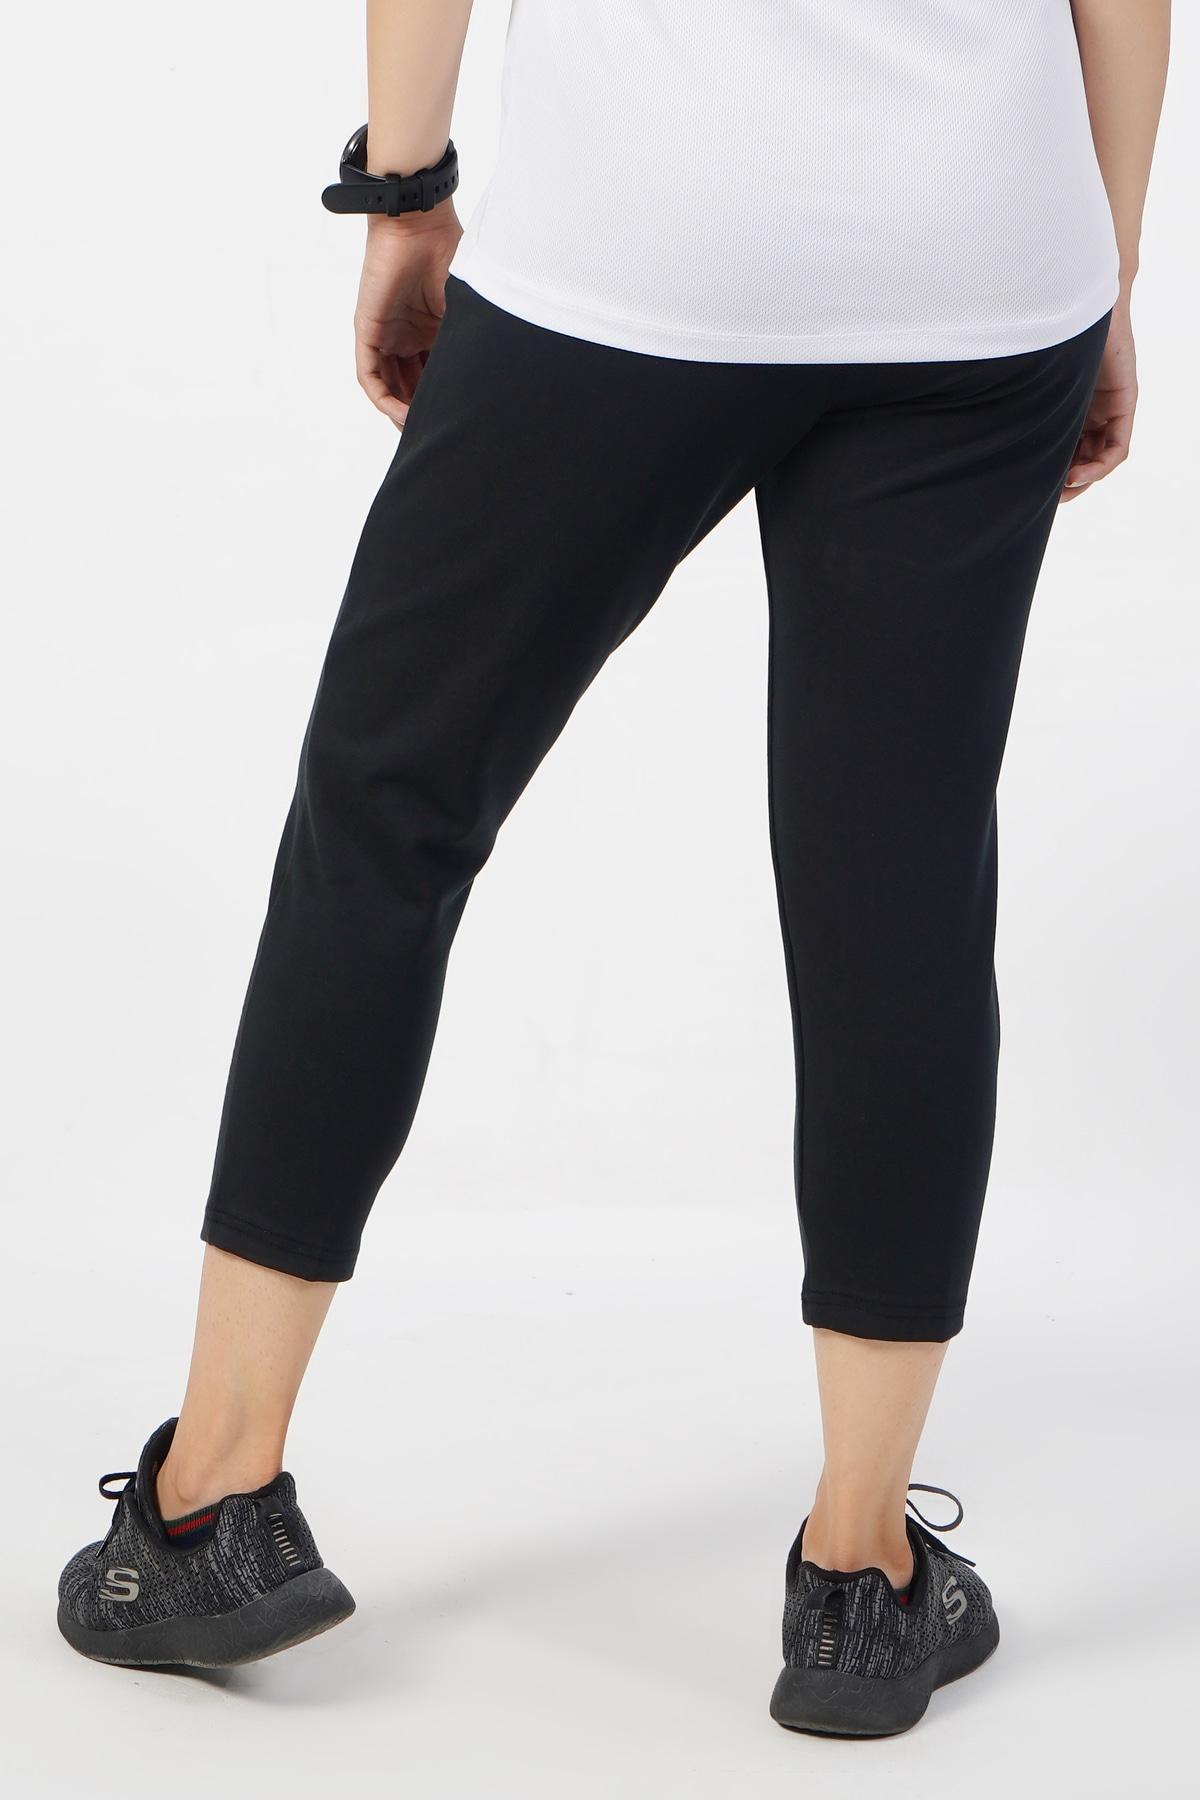 Hydrix Capri Jogger Pants - Women